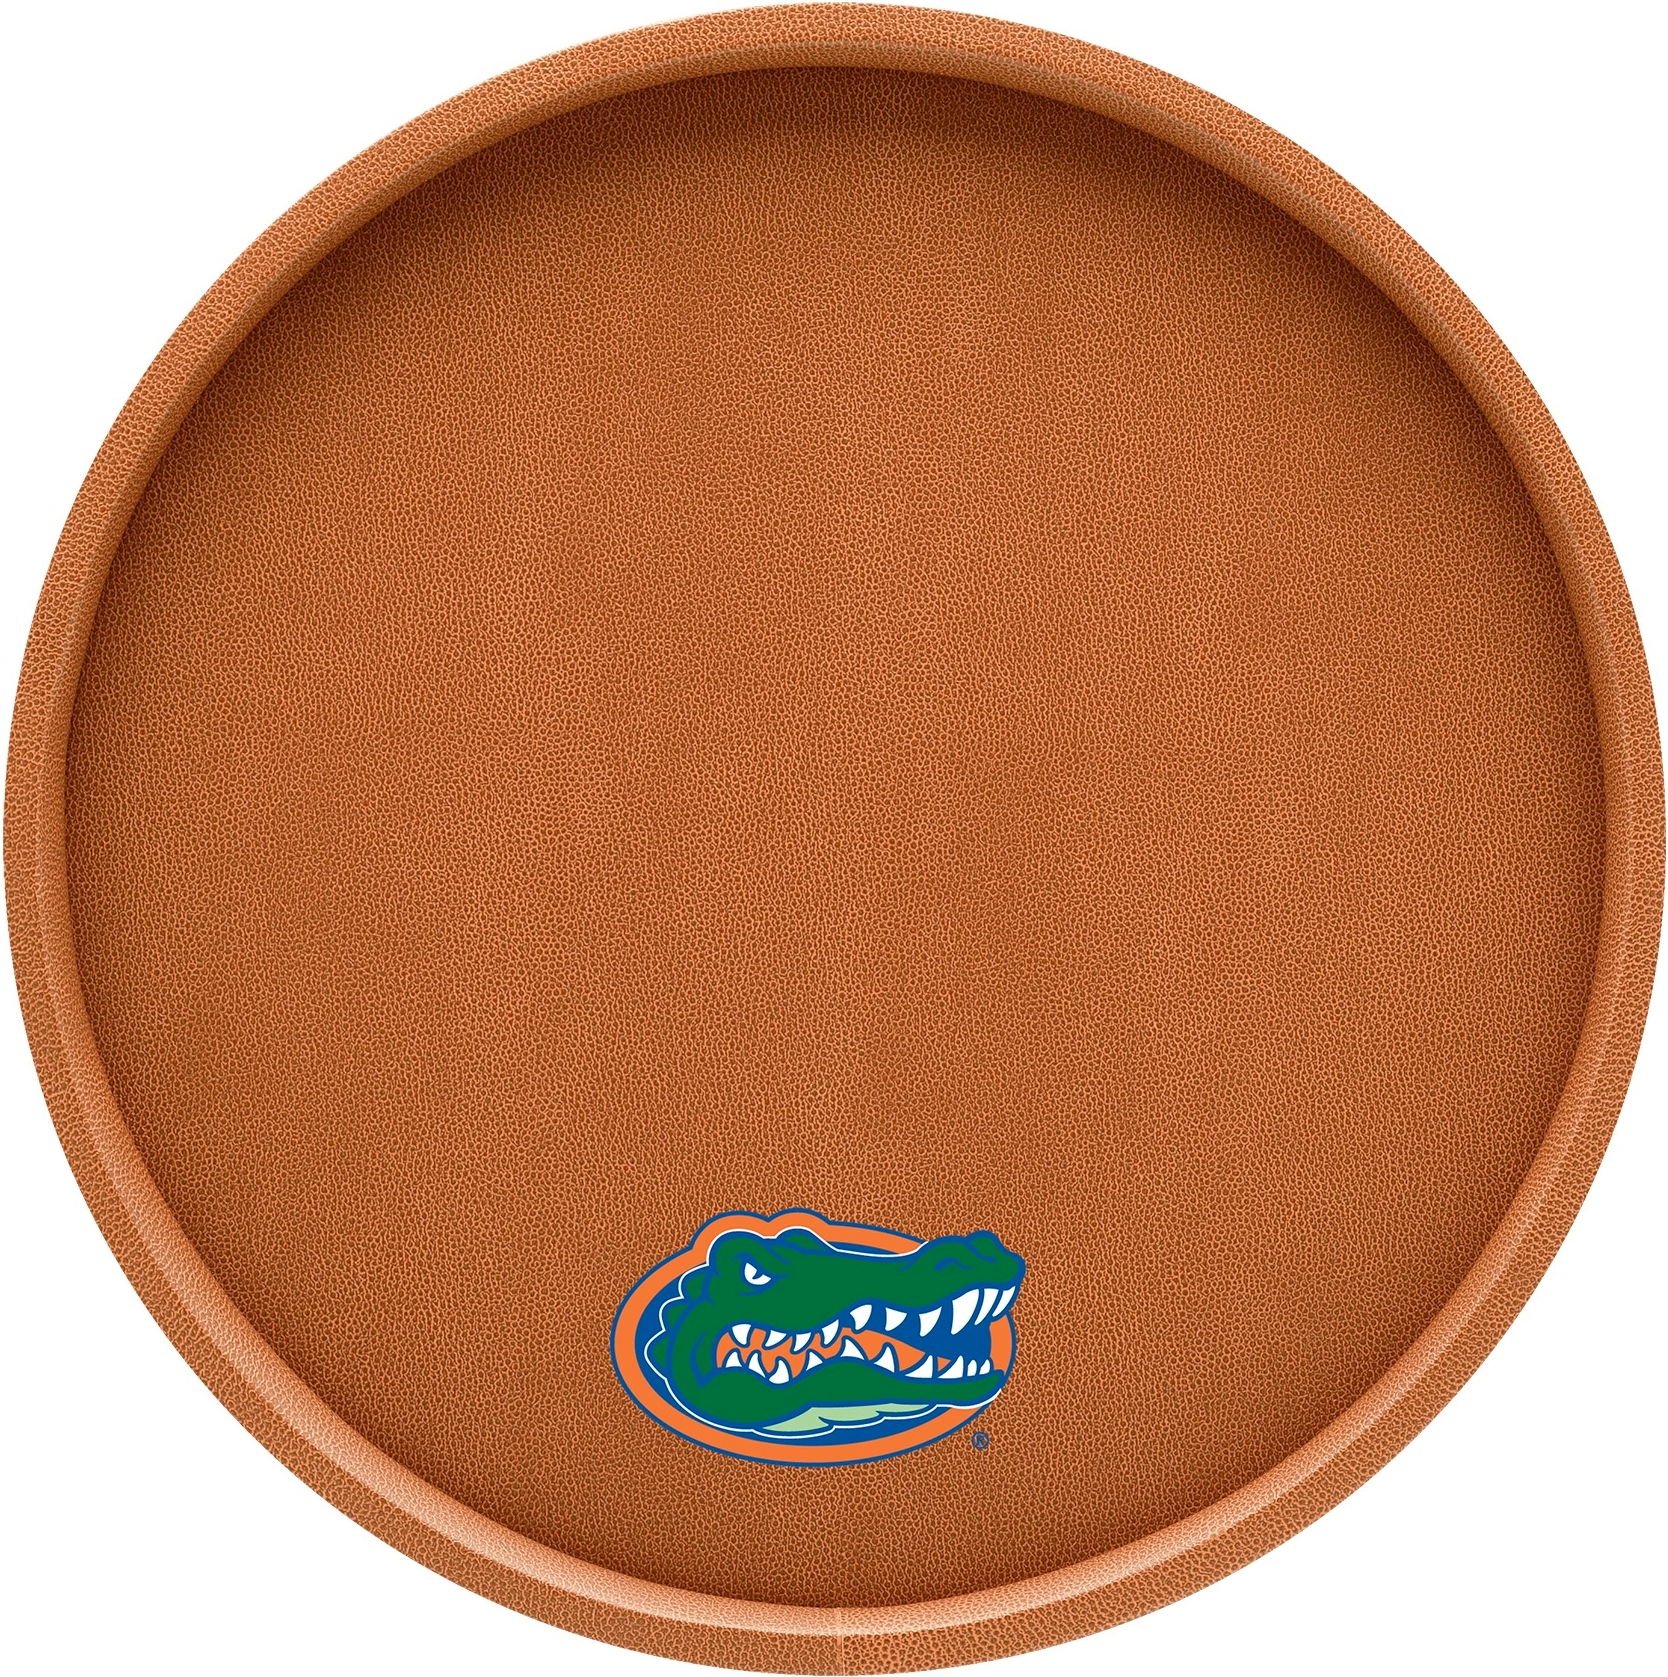 Kraftware Collegiate Collection Florida Basketball 14 Inch Serving Tray